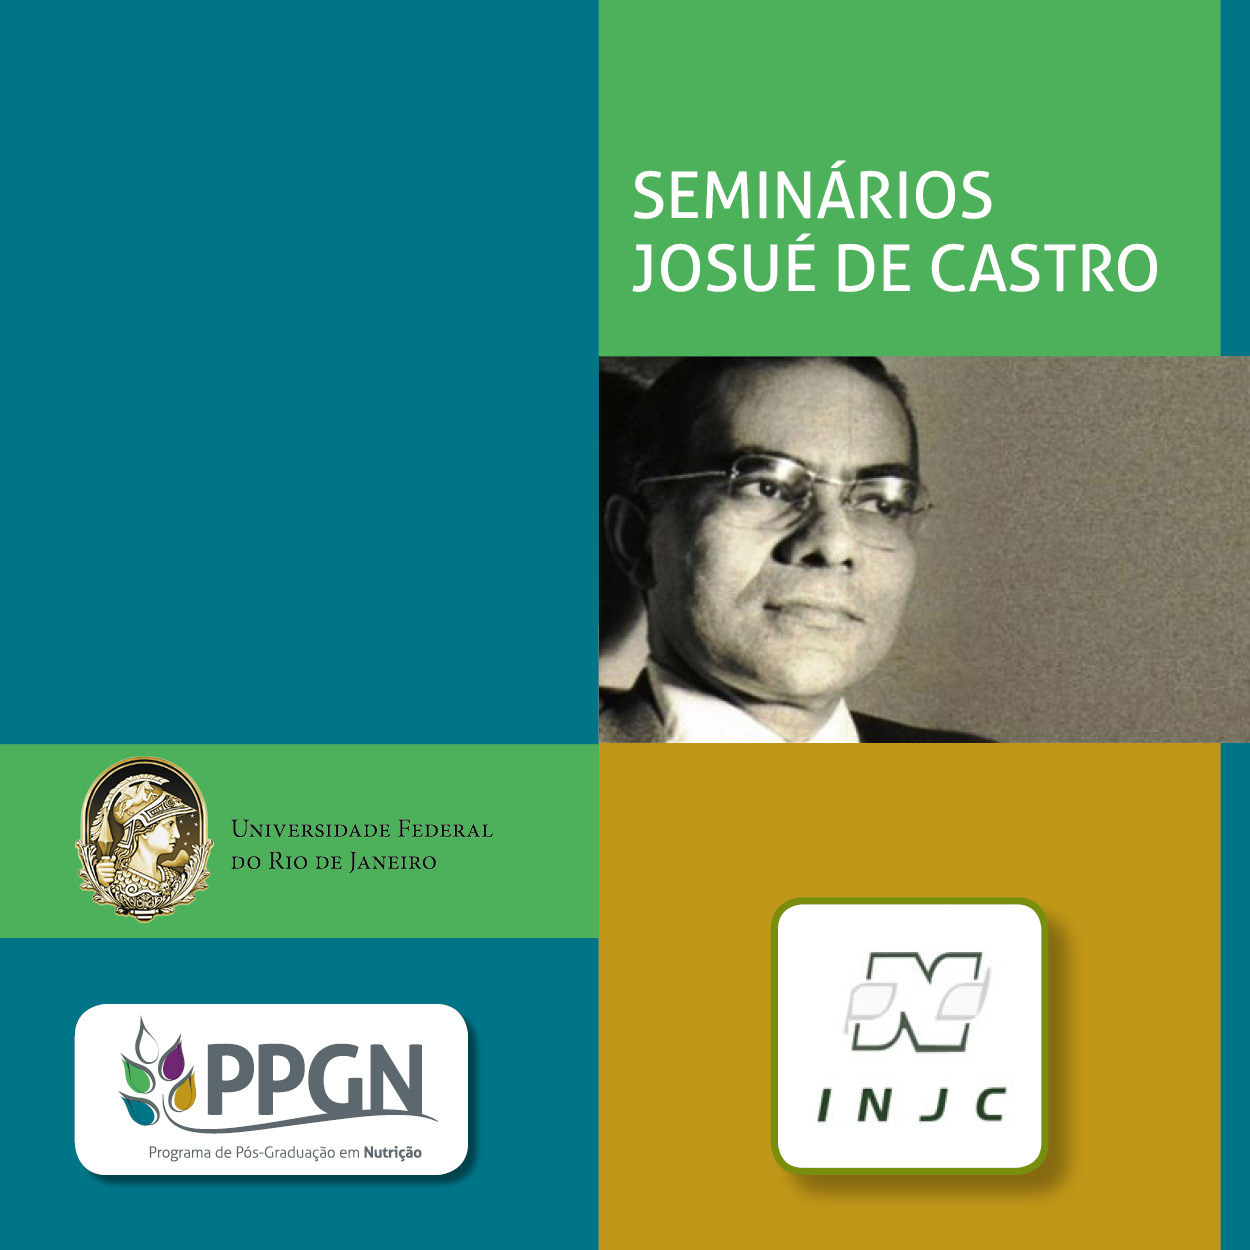 Josué de Castro Seminars